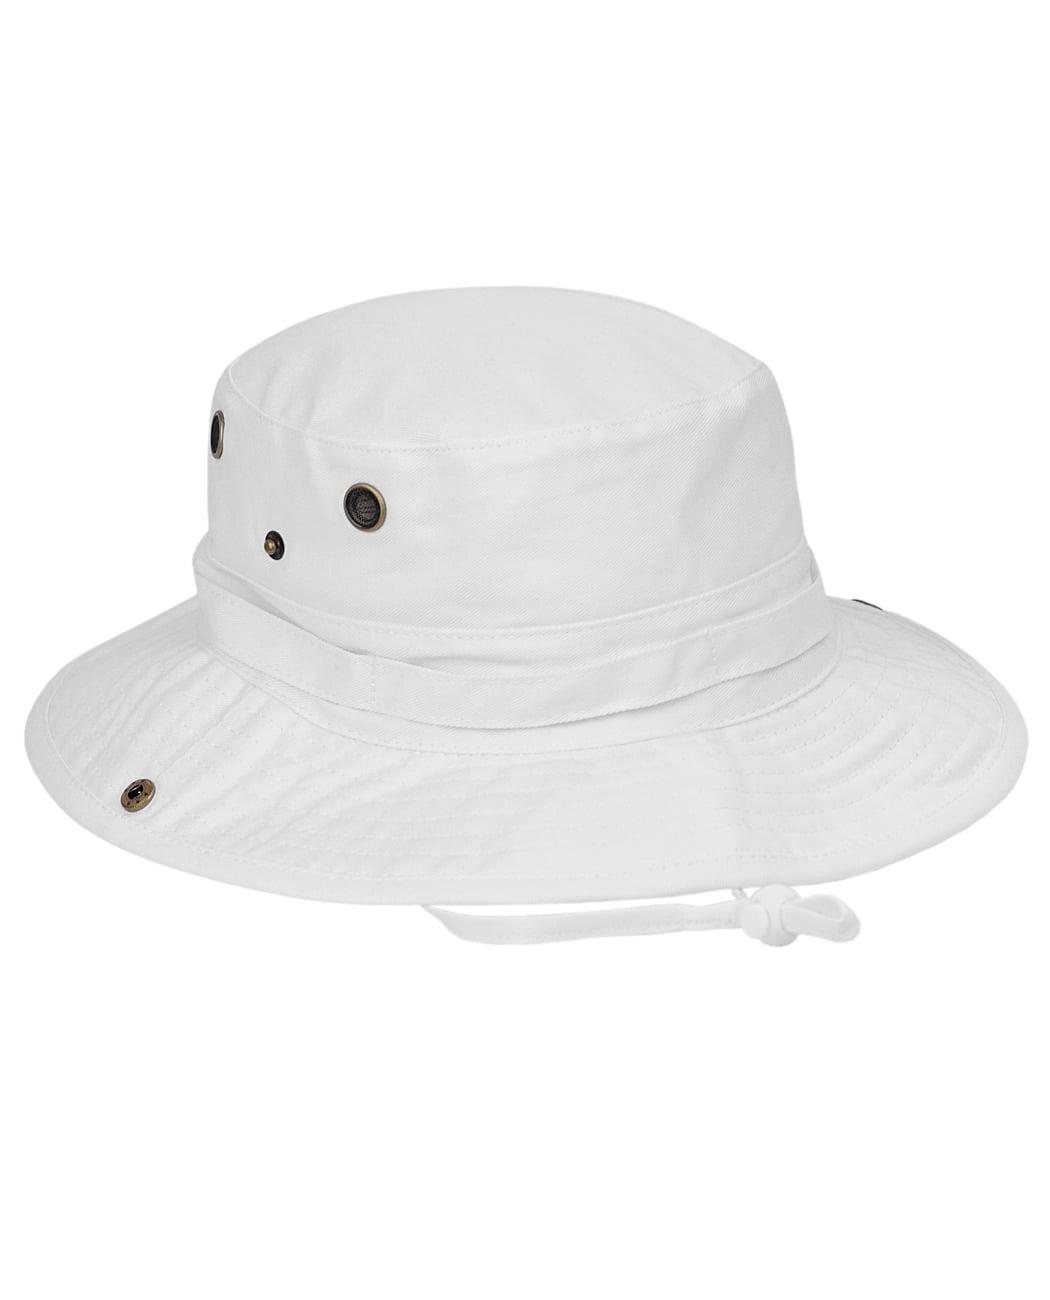 NYFASHION101 Men s Crushable Snap Brim Cotton Outdoor Bucket Sun Hat ... 78bae7fa233